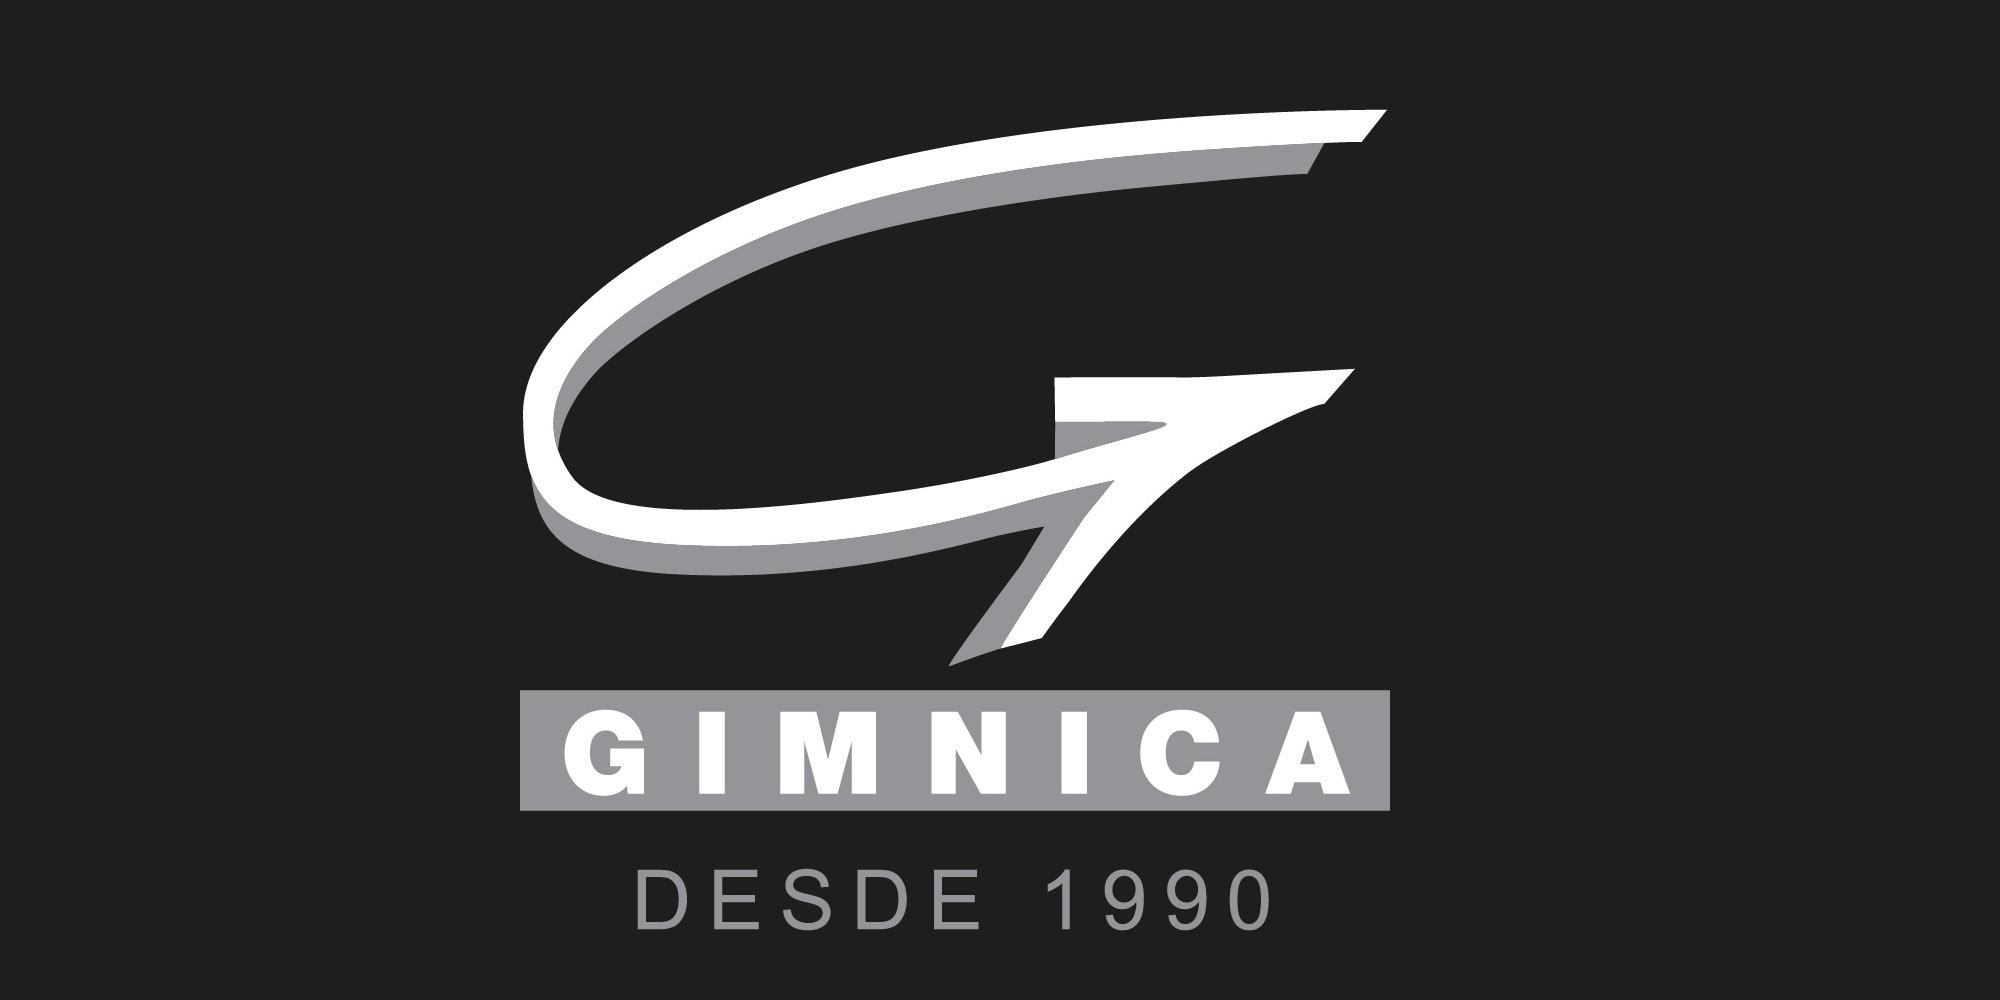 Village_gimnica-02